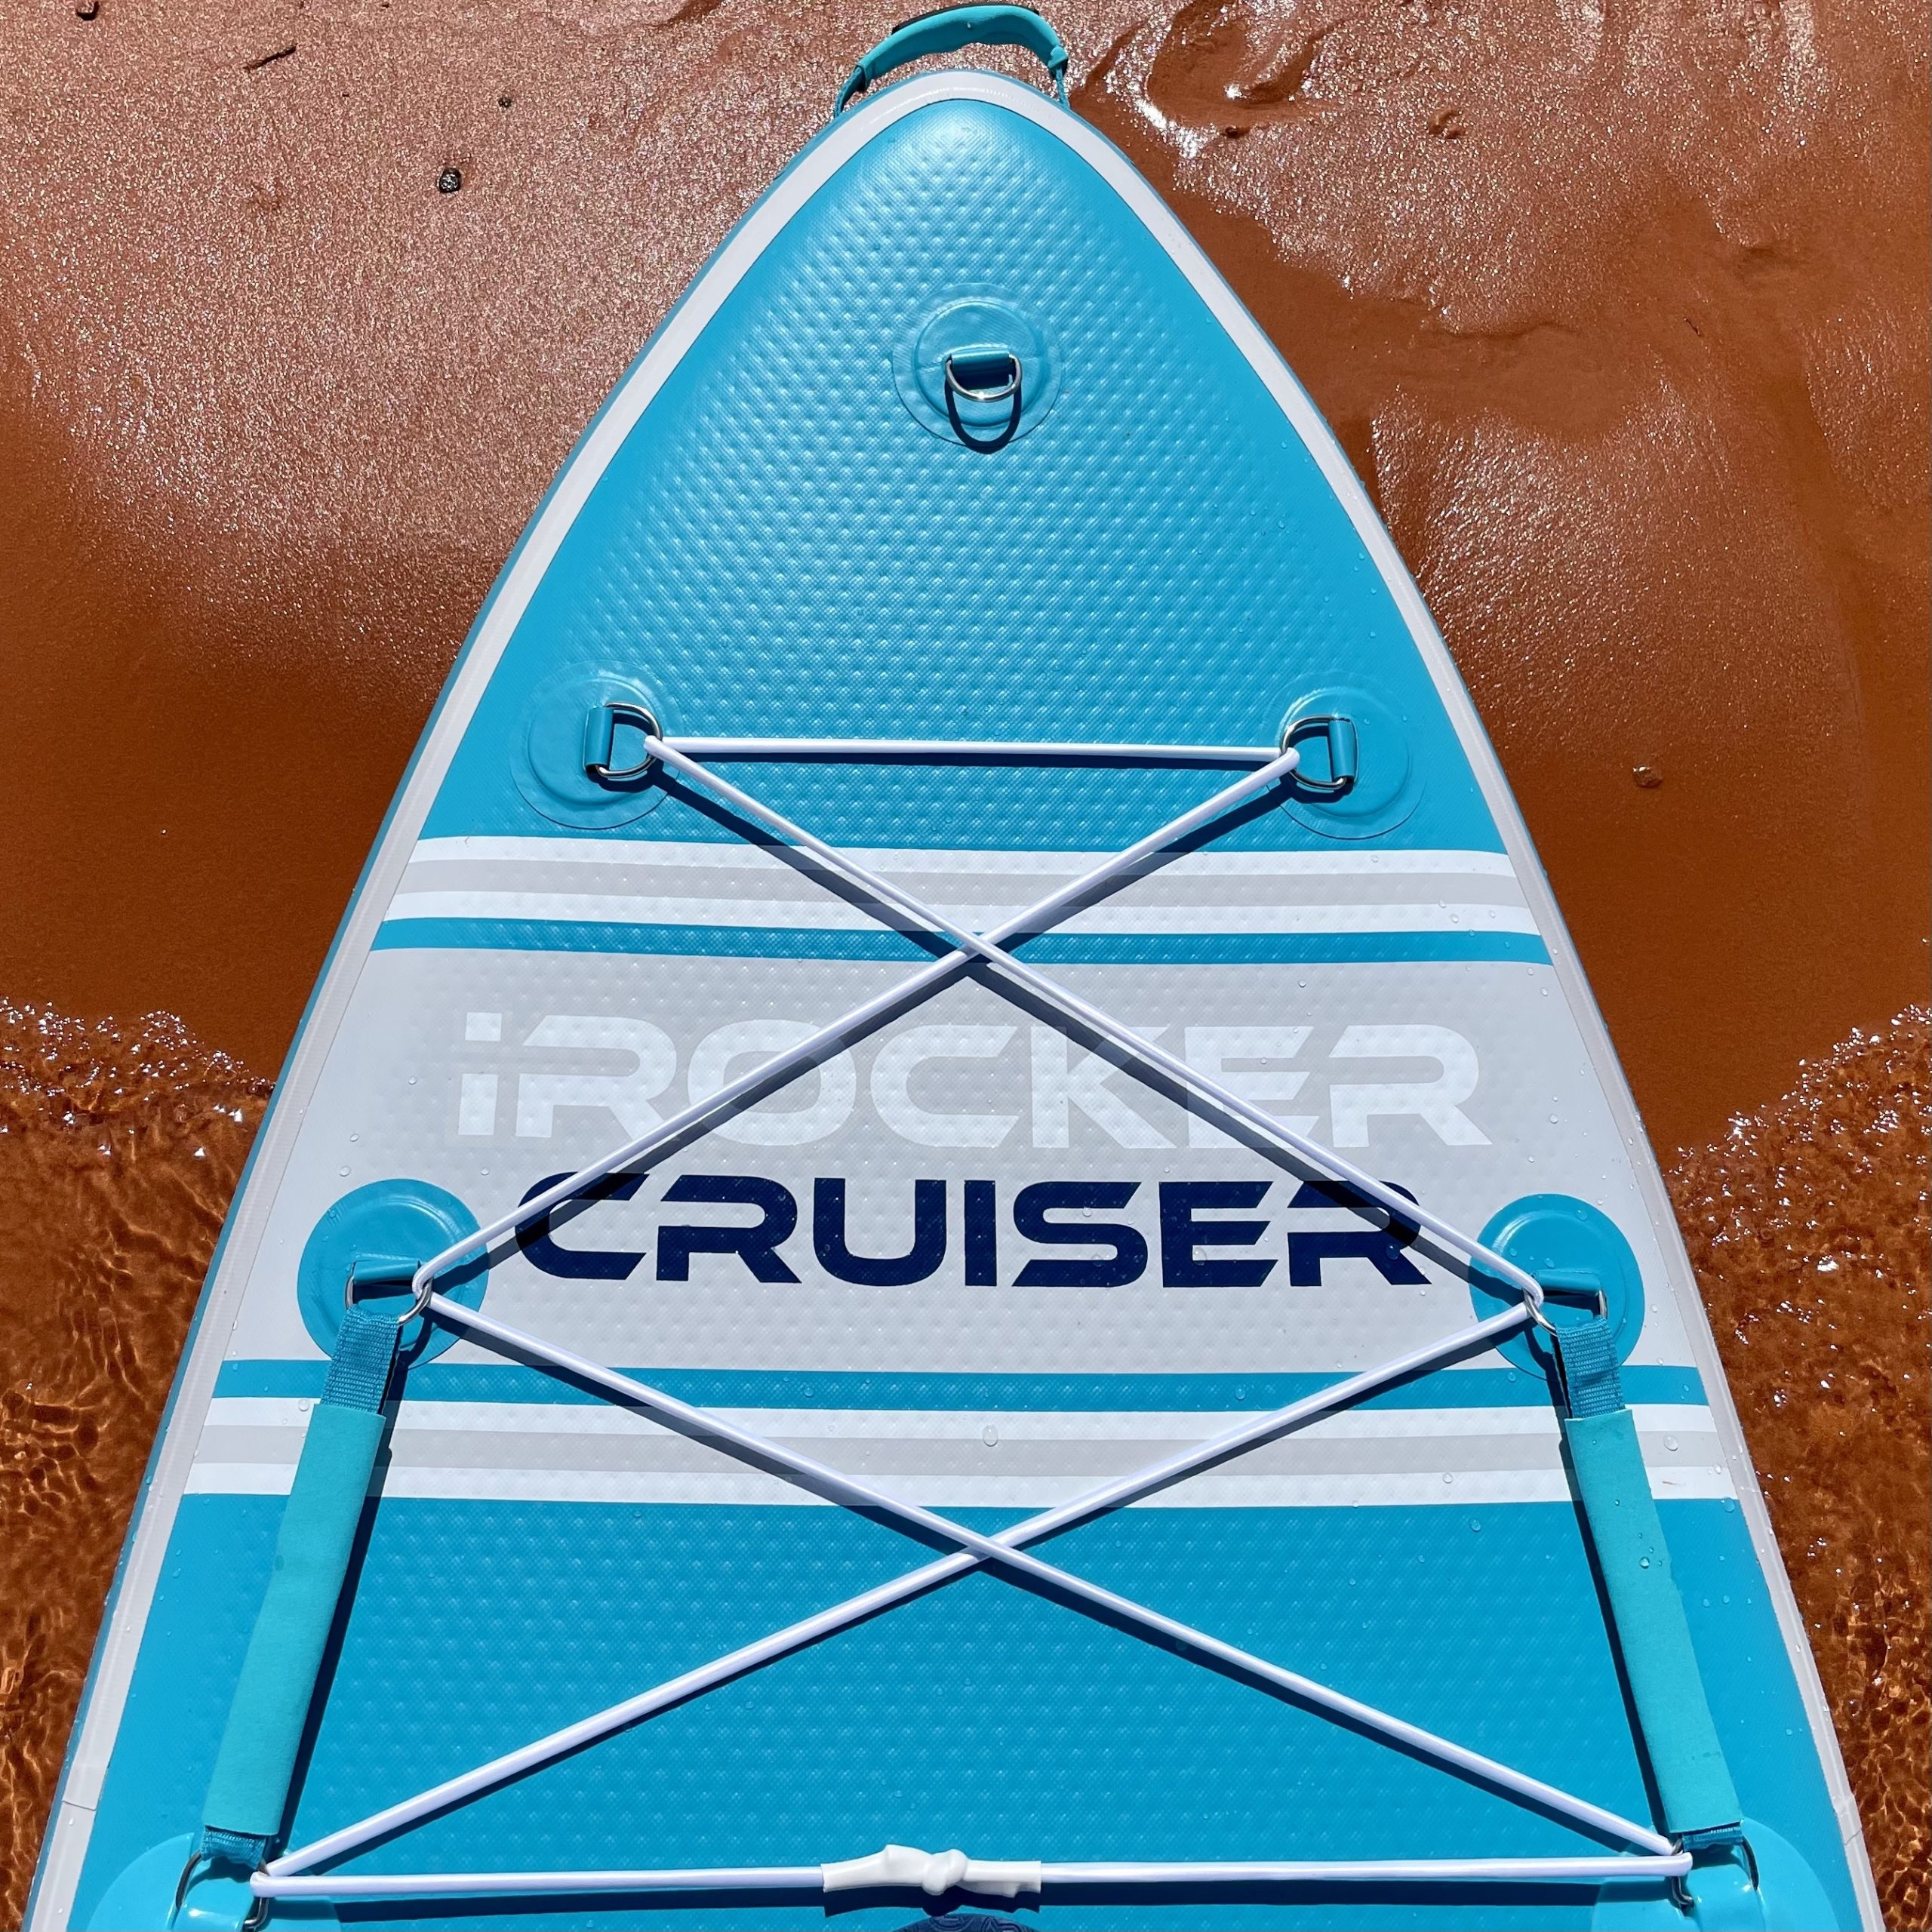 iRocker Cruiser inflatable SUP